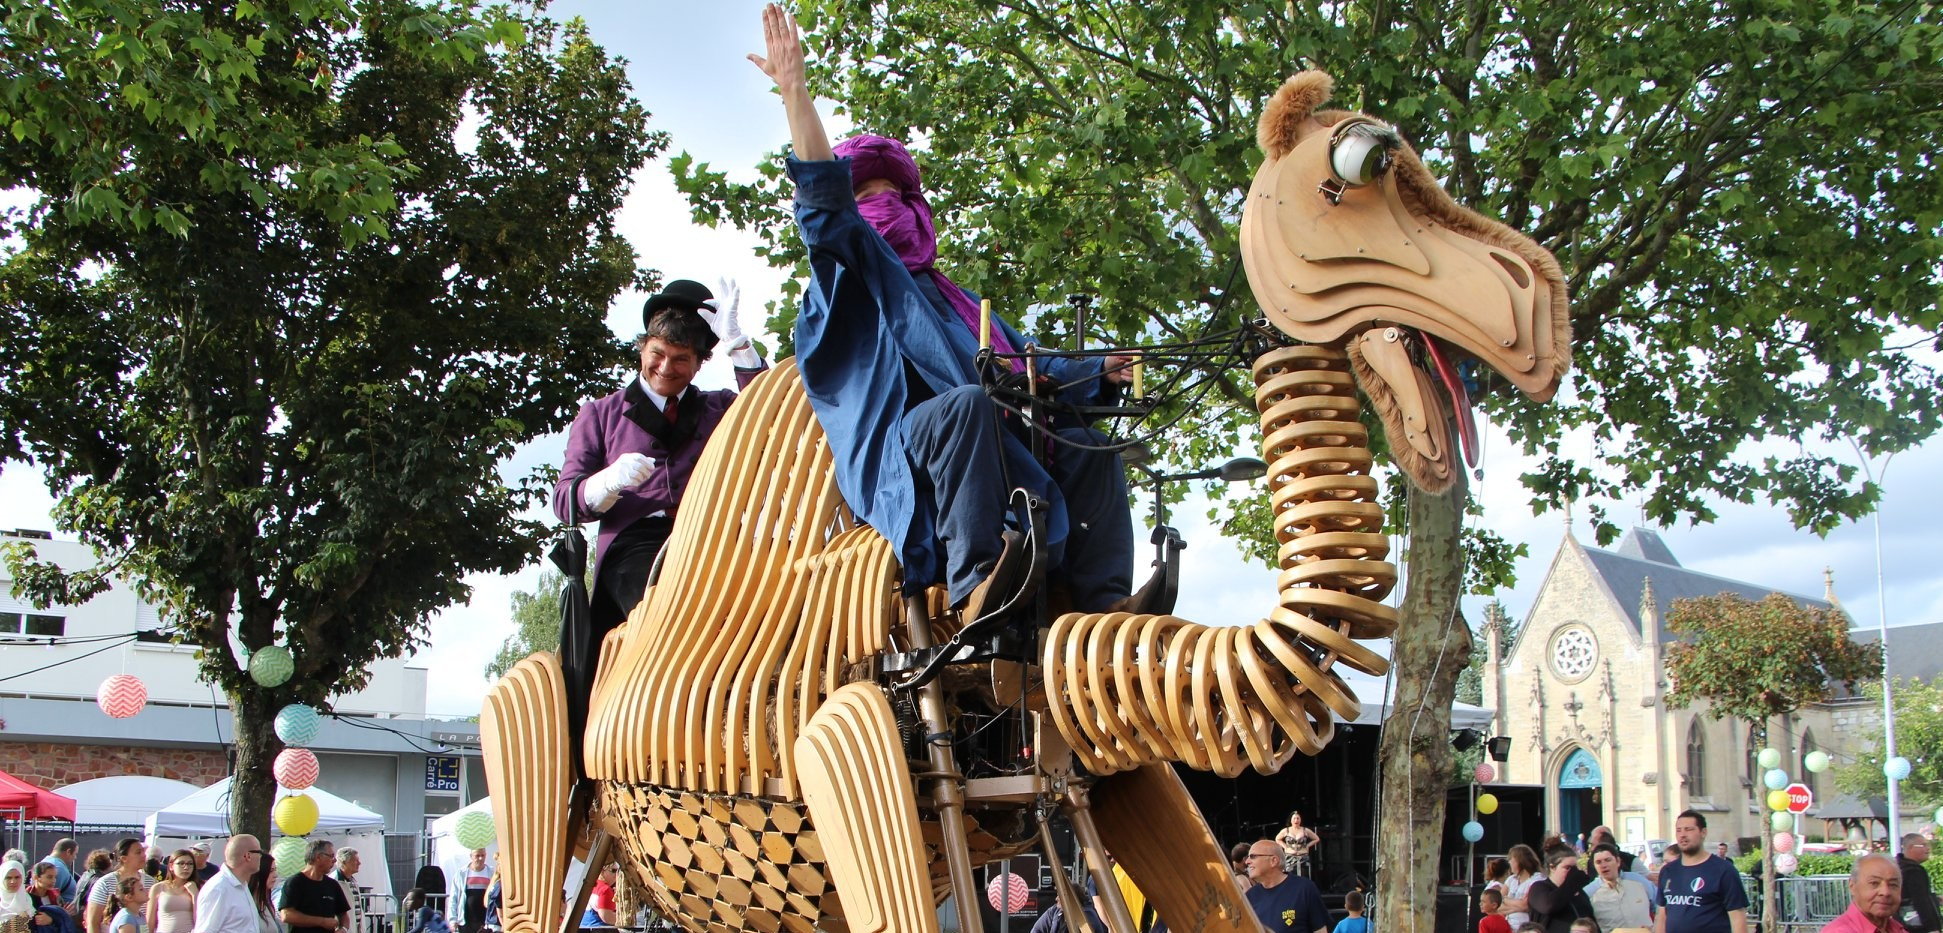 Balade orientale Acidu spectacle rue dromadaire bois machine